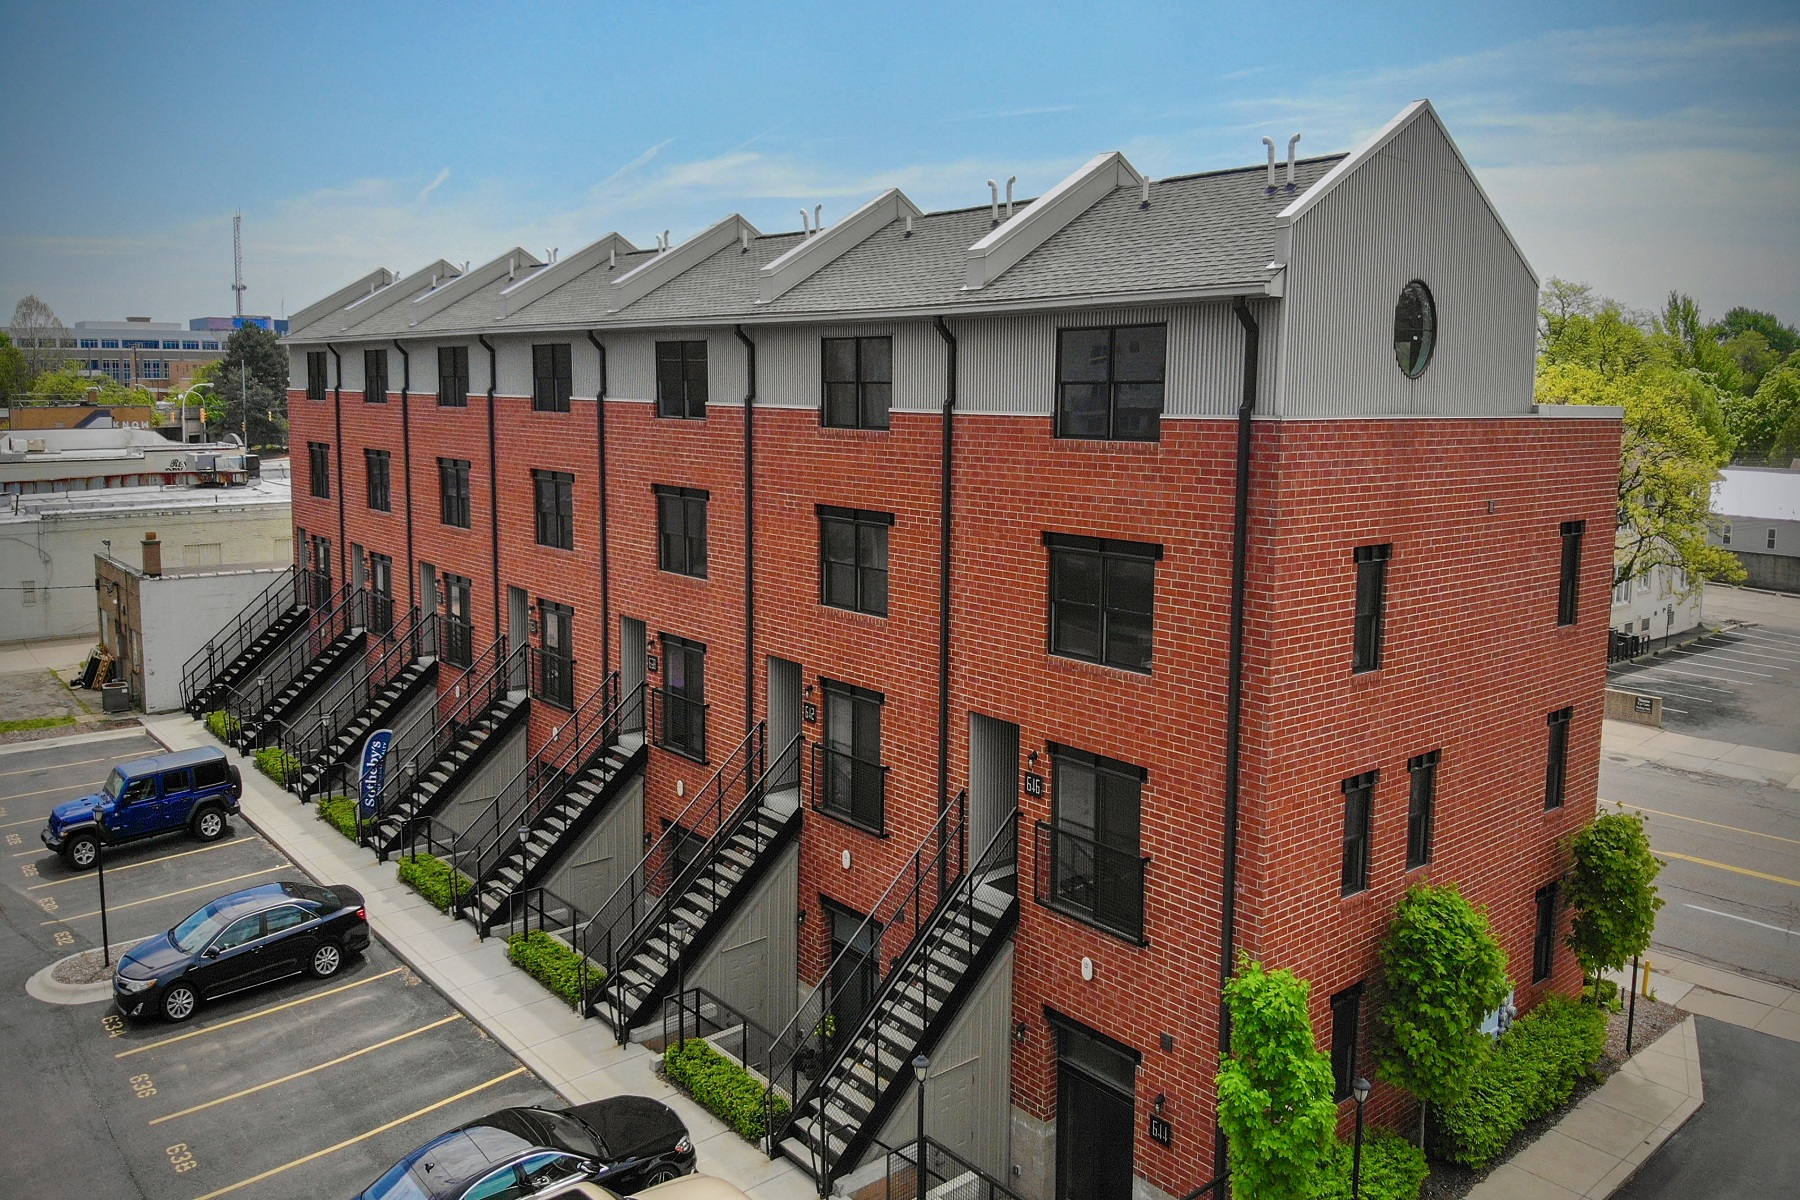 Condominiums 为 销售 在 Royal Oak 634 W Eleven Mile Road Unit 21 罗雅尔奥克, 密歇根州 48067 美国